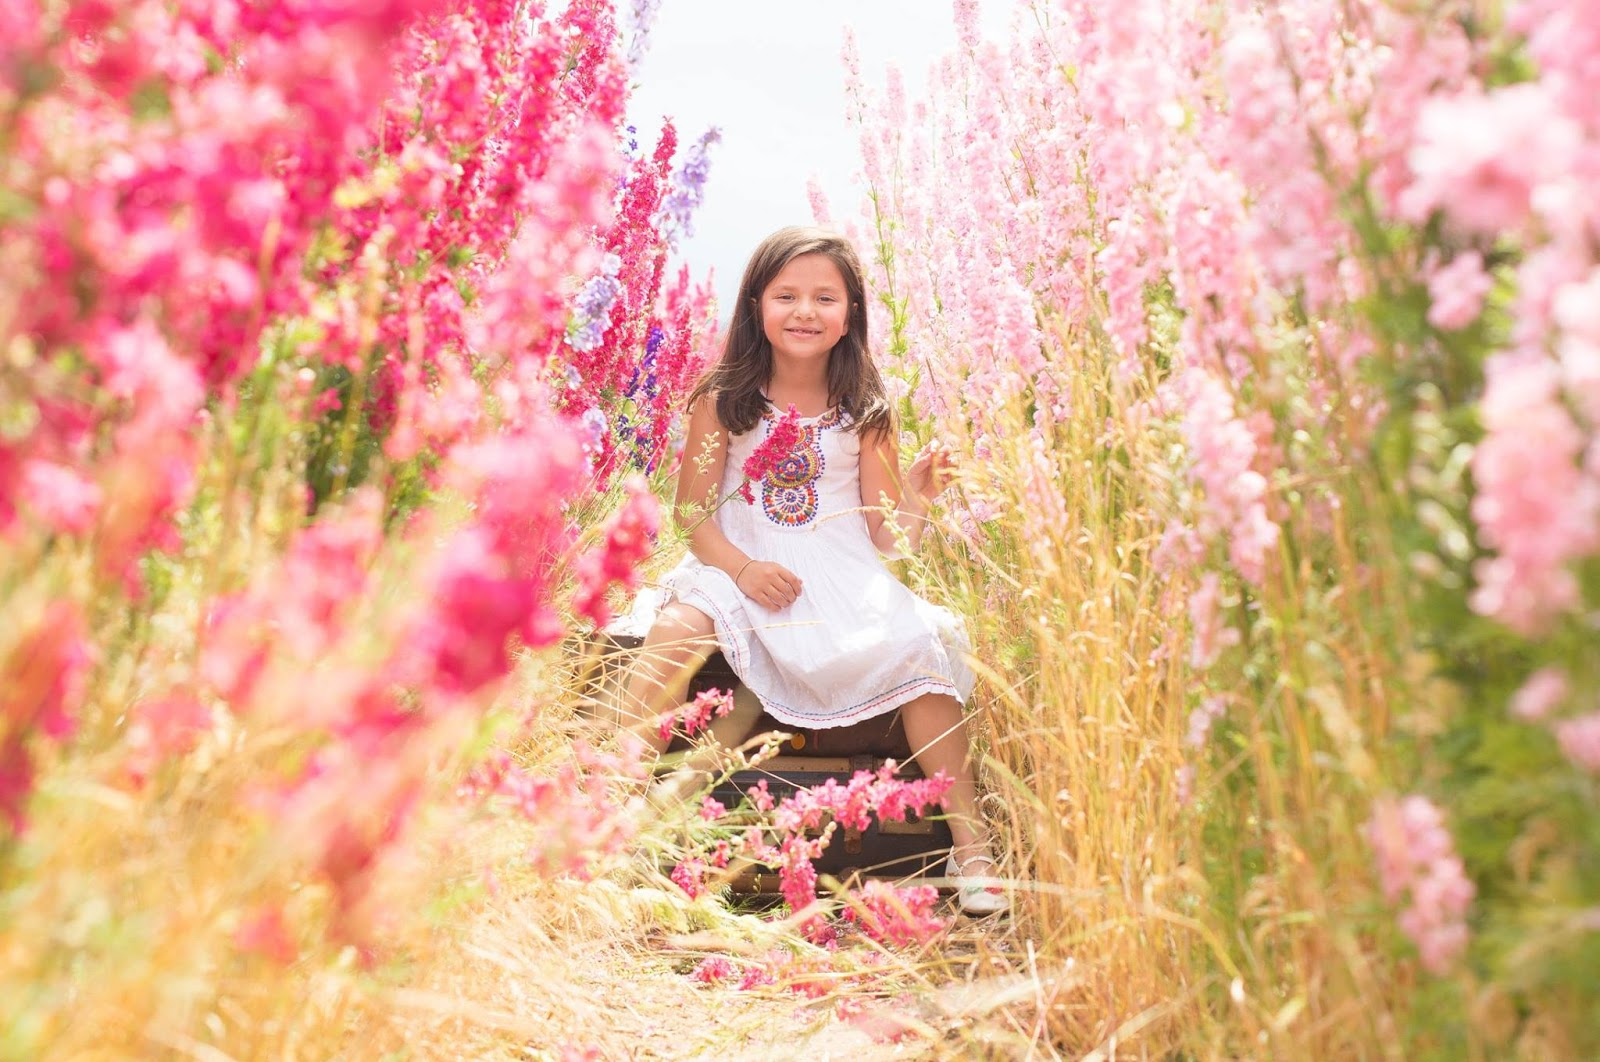 The Confetti Blog The Real Flower Petal Confetti pany s Confetti Flow